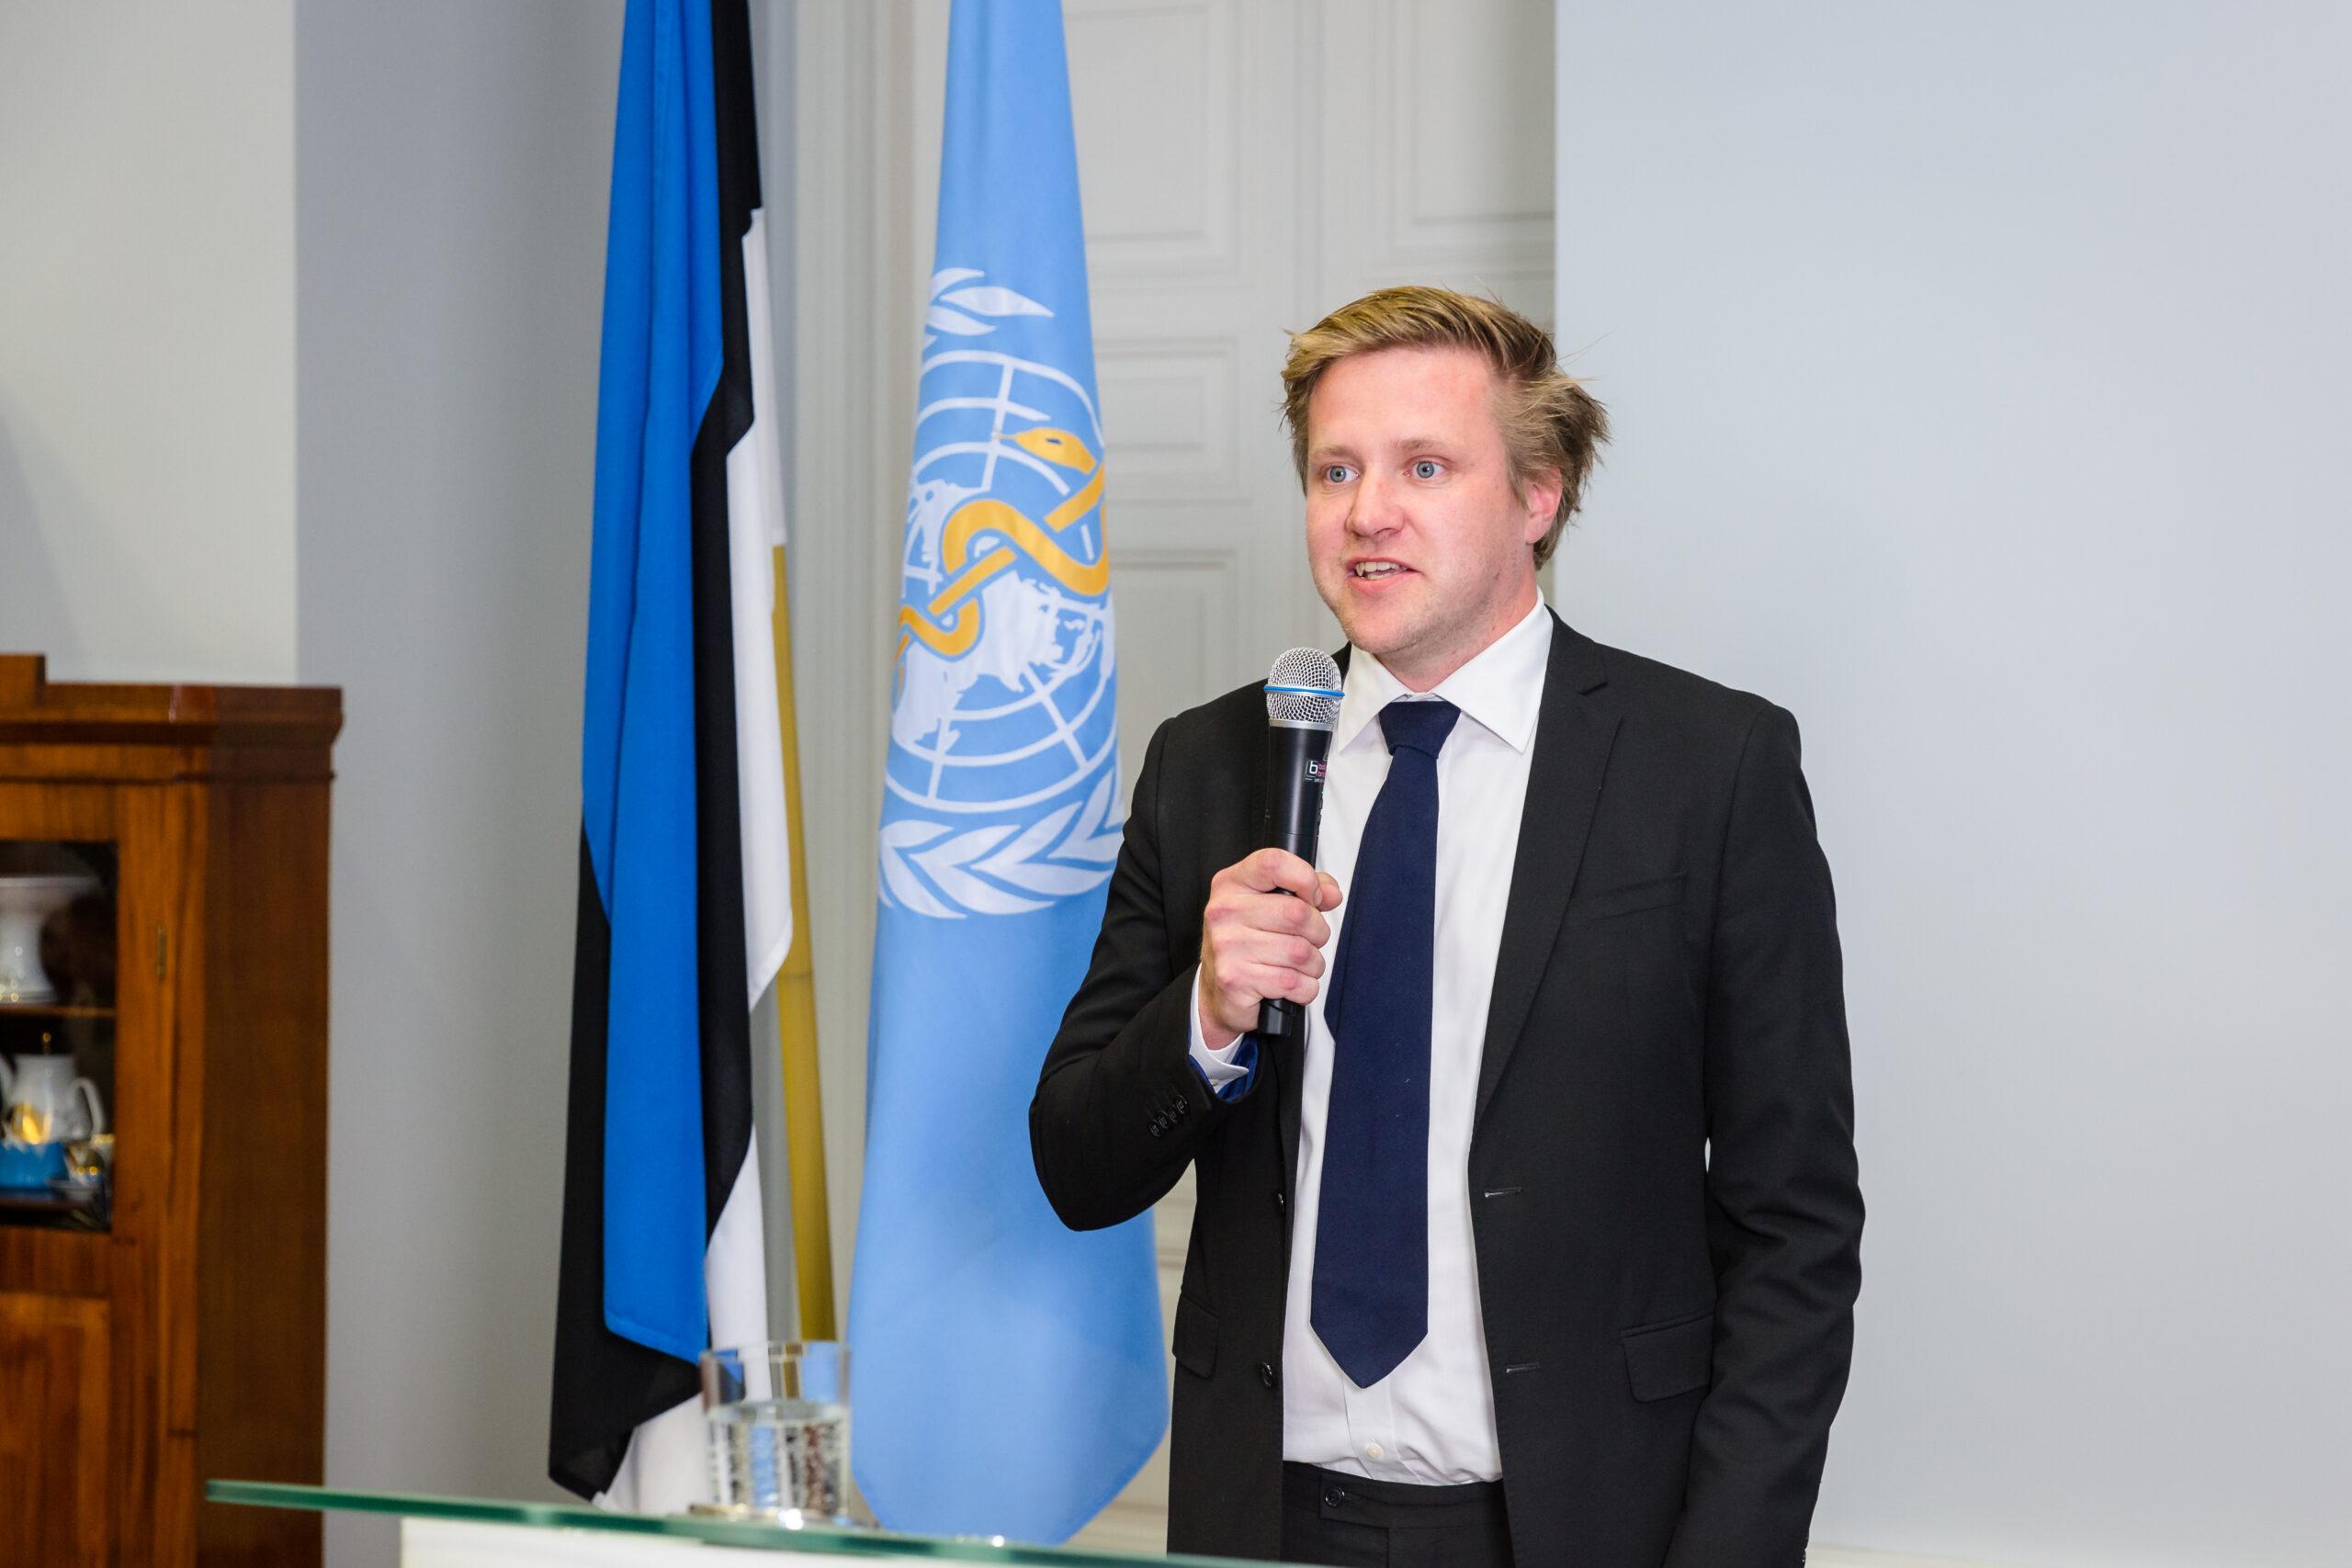 Marten Kaevats, State Chancellery